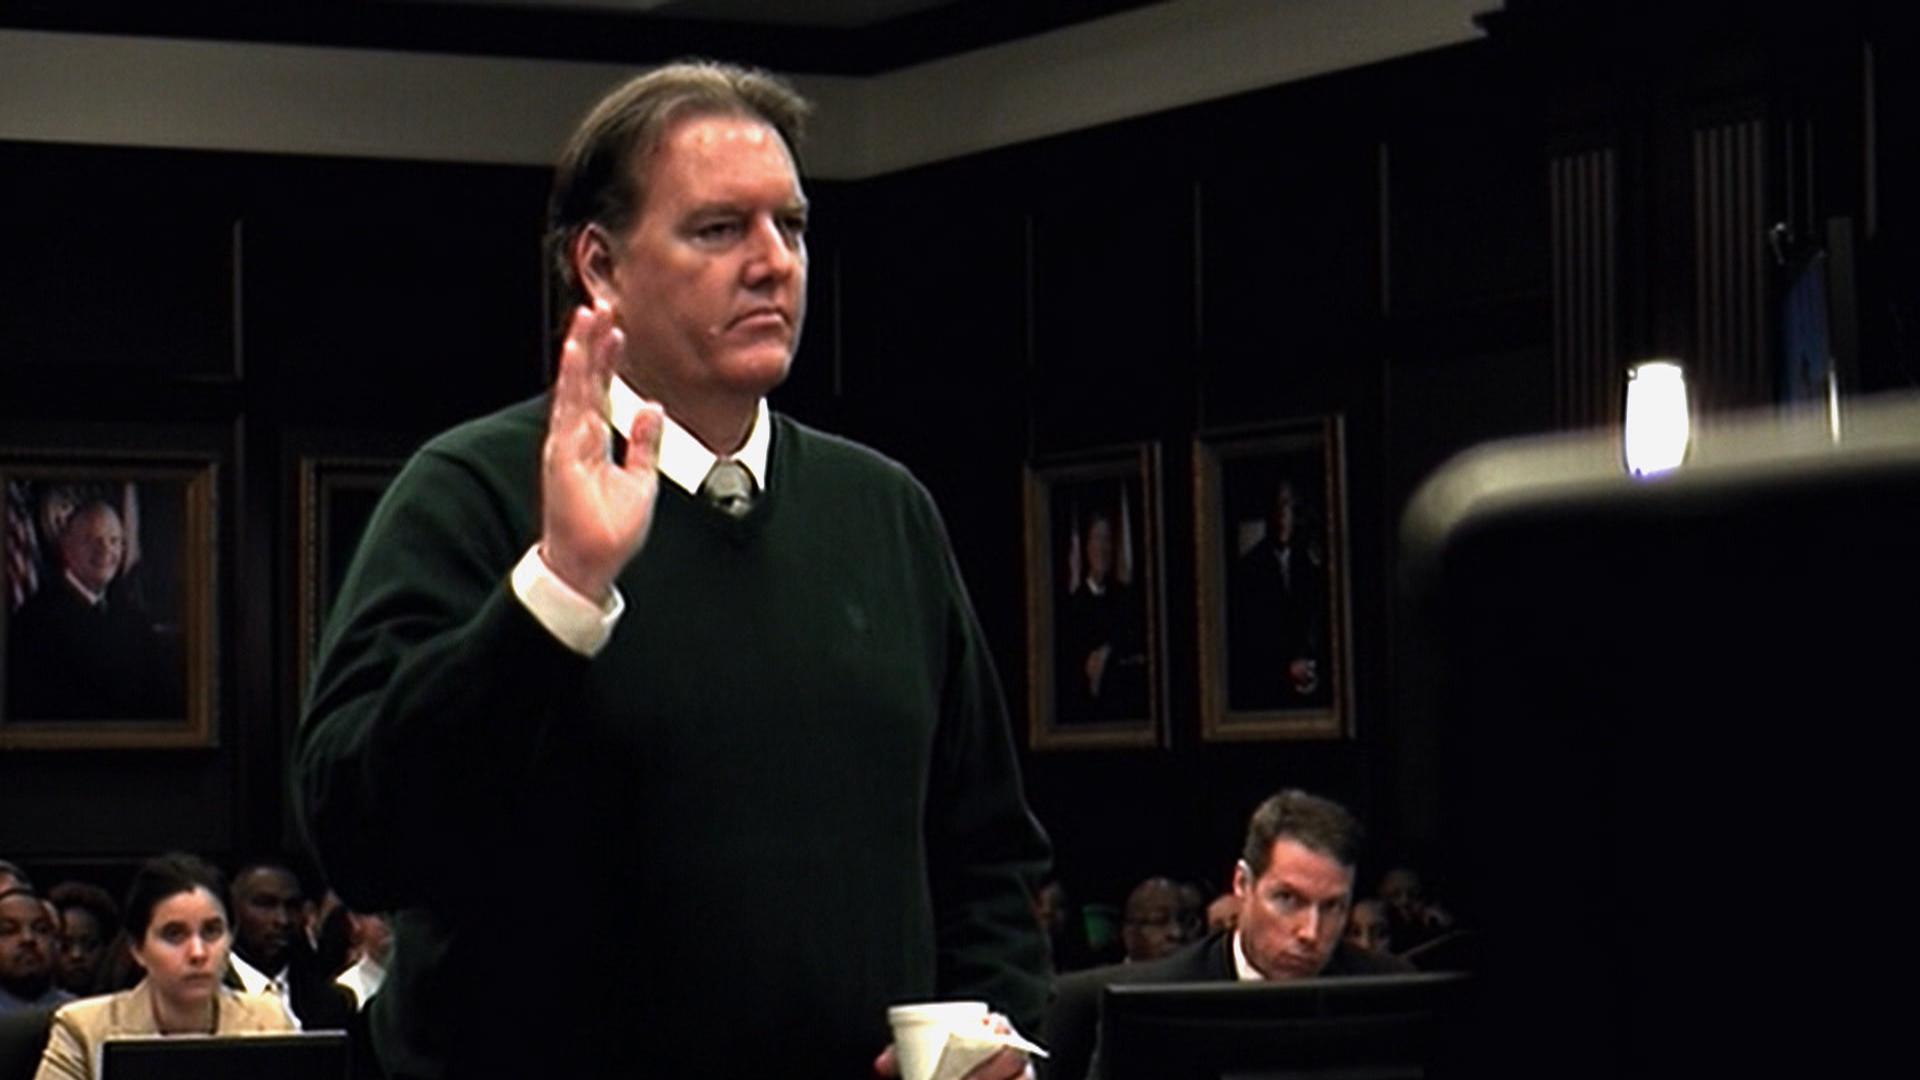 Jury deliberating in Michael Dunn case